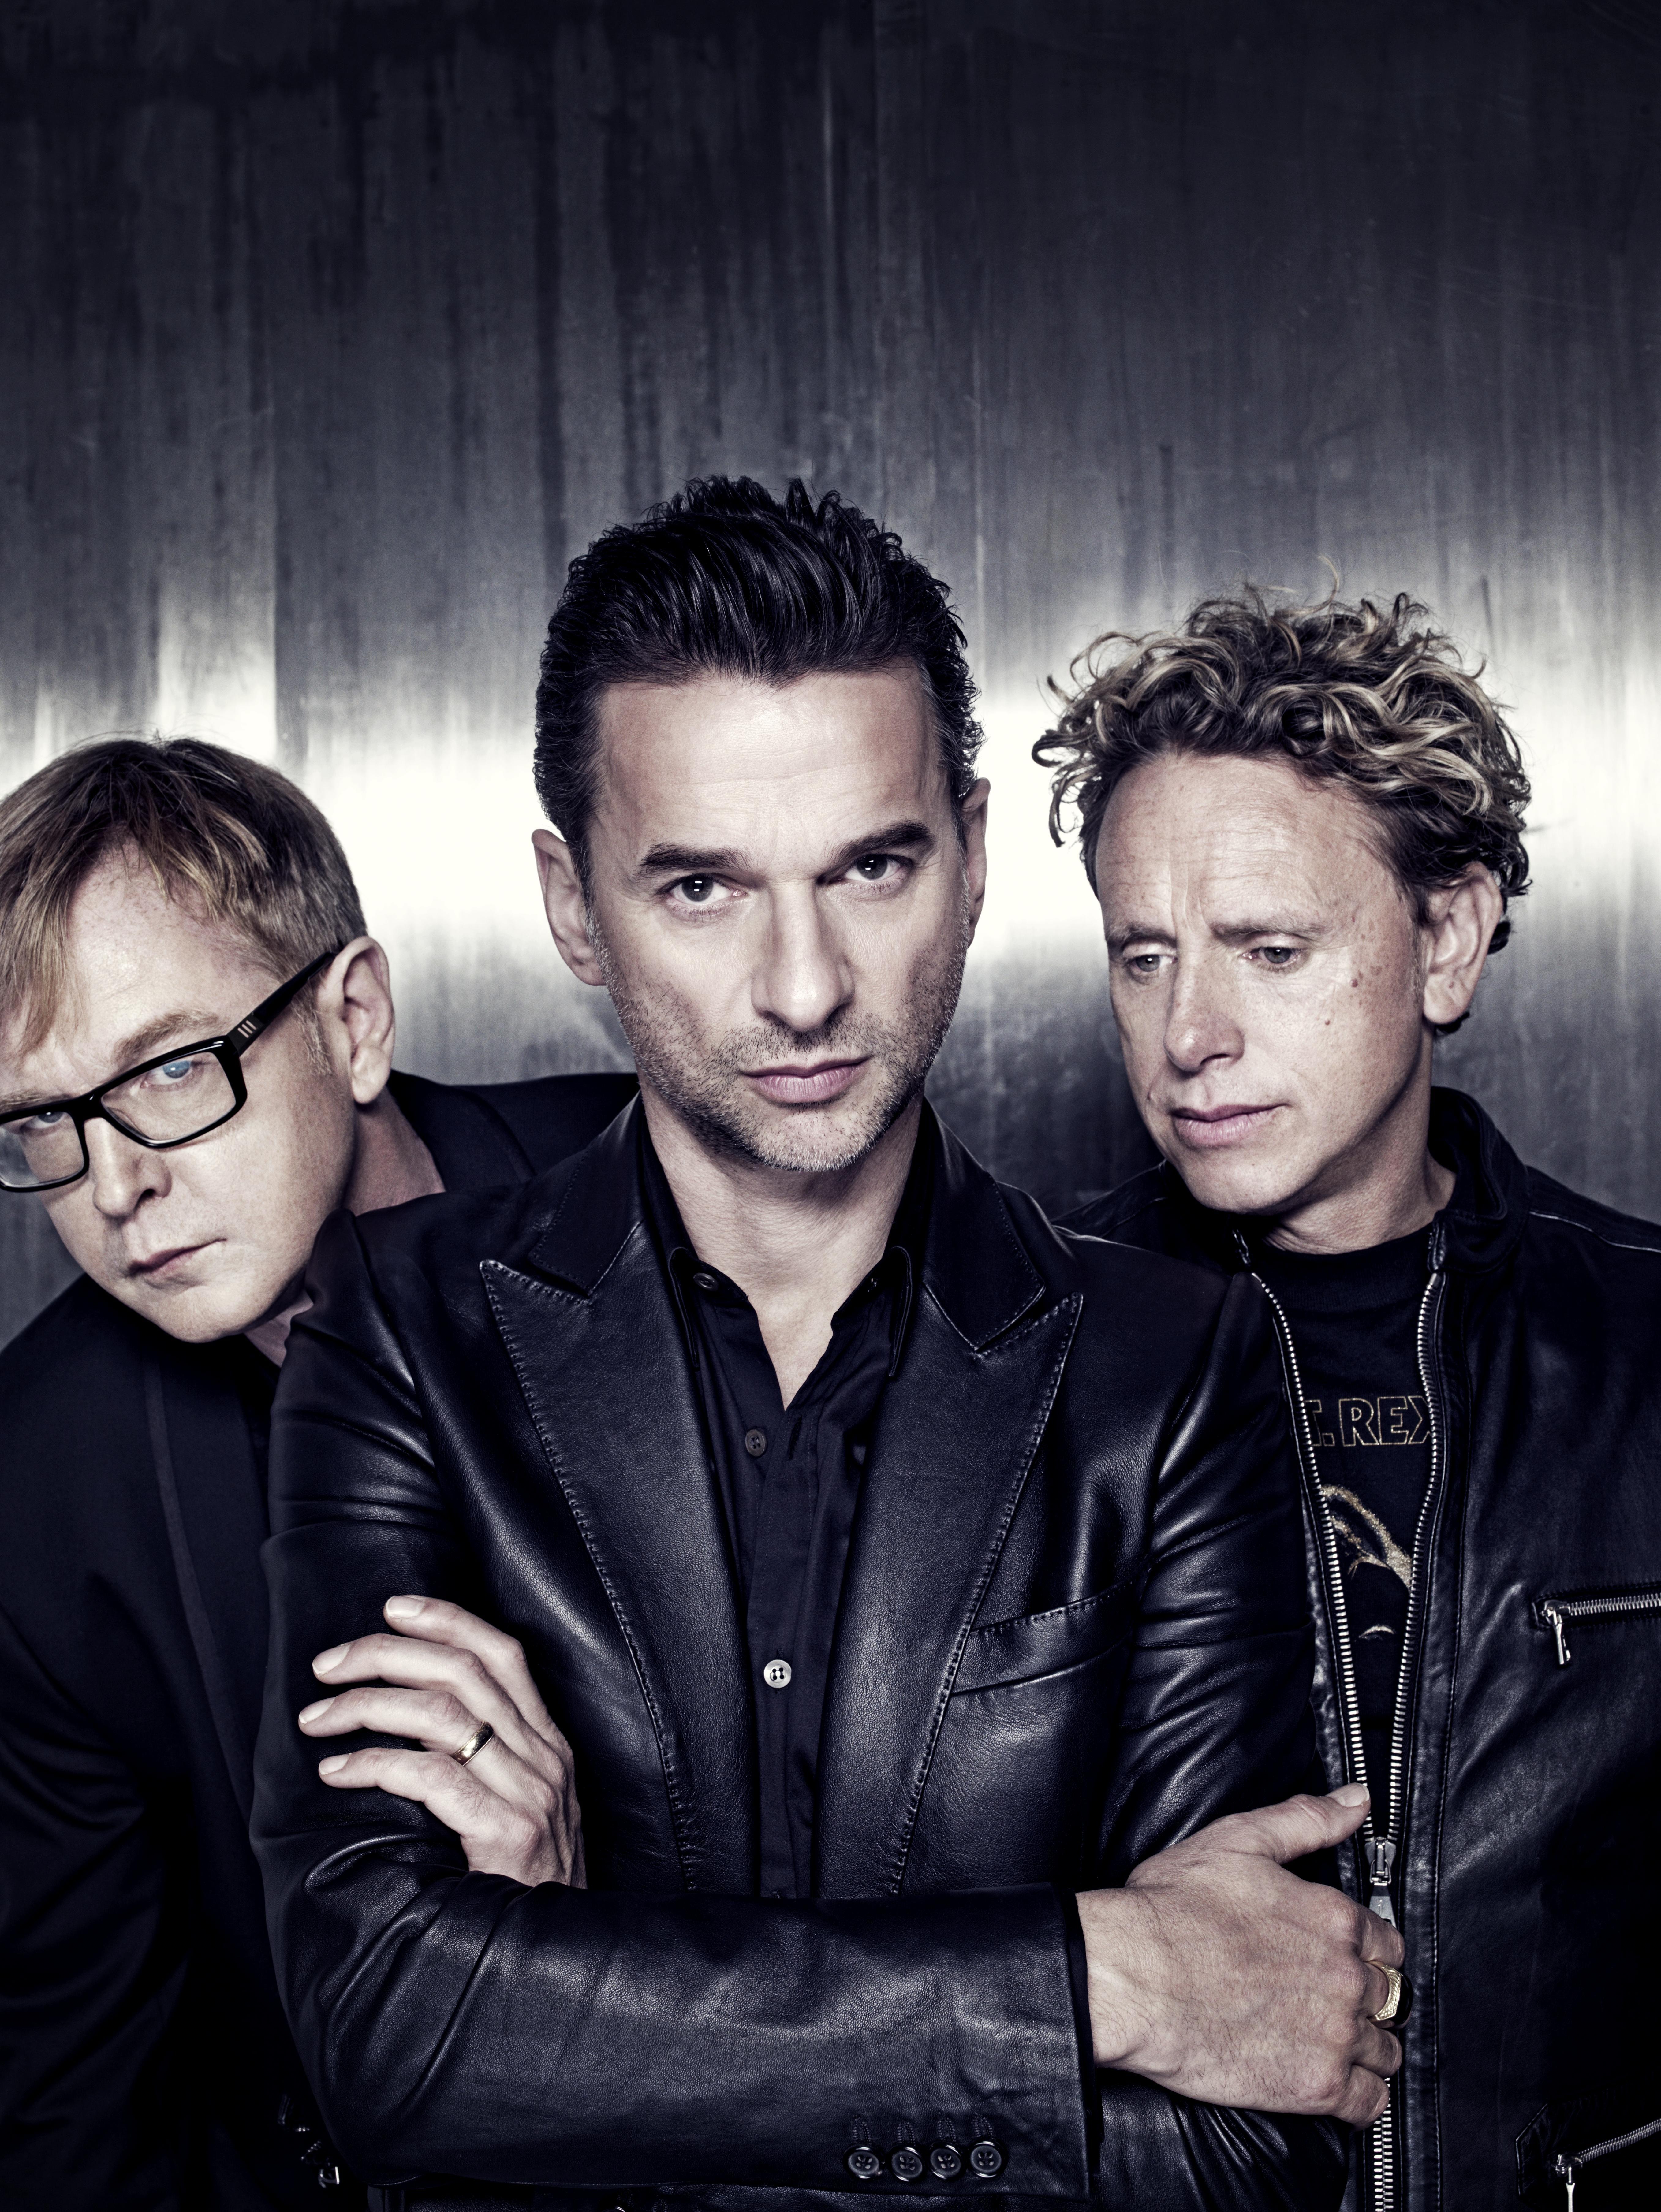 Depeche Mode Tour 2019 Energy! Inspiring band Depeche Mode | Dave Gahan / Depeche Mode in